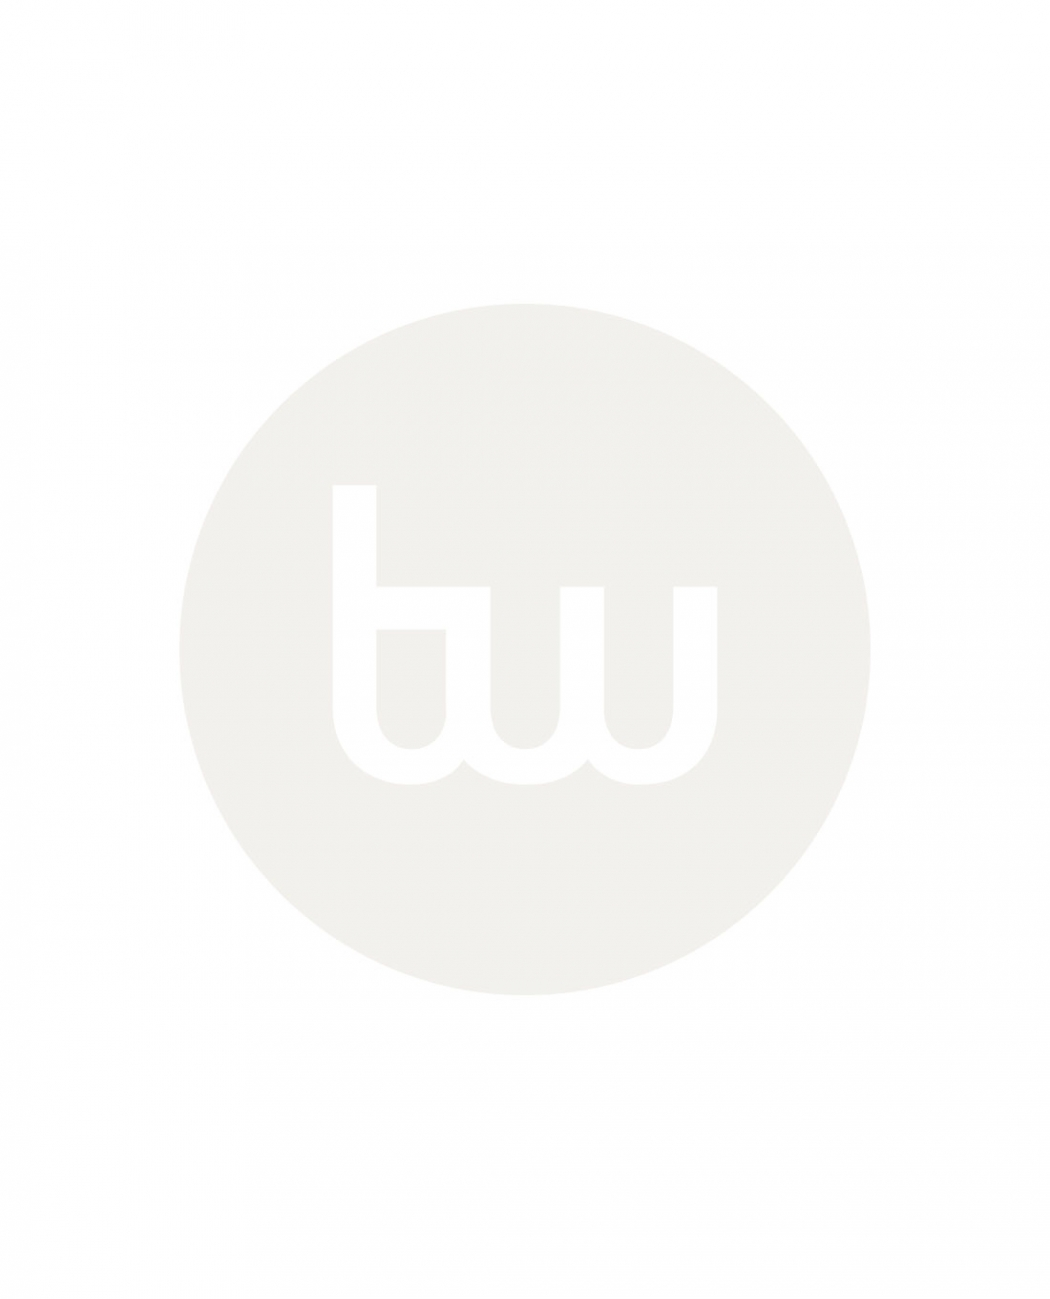 25cdcbbcdd01 Oakley SI Ballistic M-Frame 3.0 Matte Black / Array Clear, TR22 ...